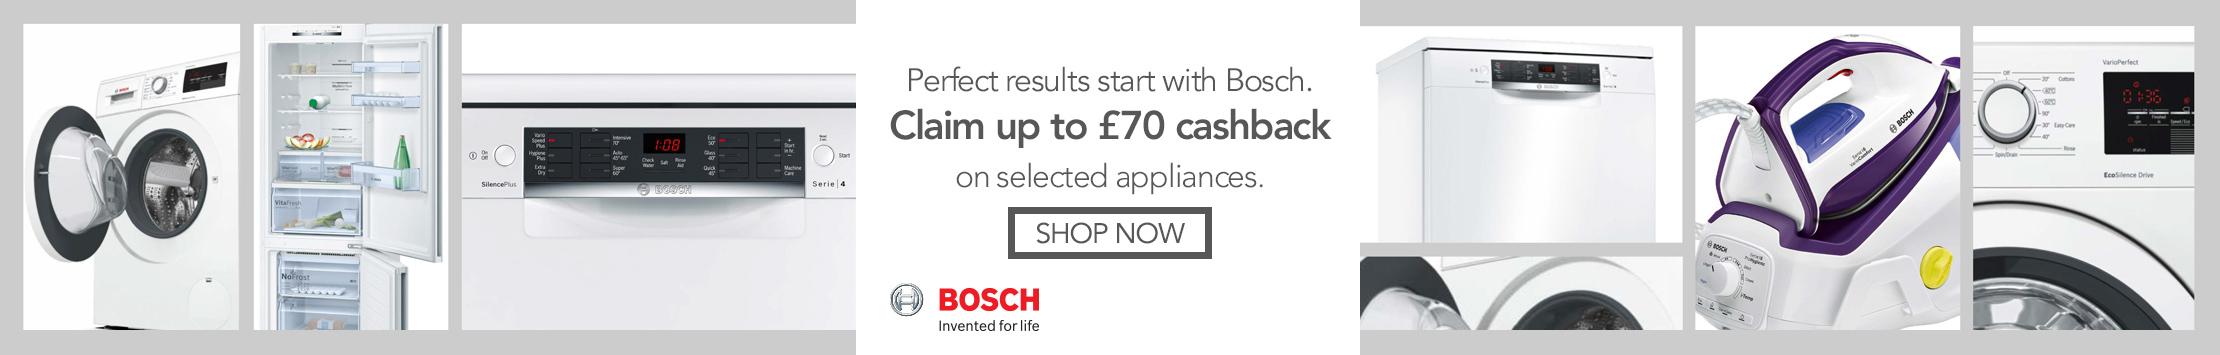 Bosch-70-Cashback-homepage-desktop-2220x355px